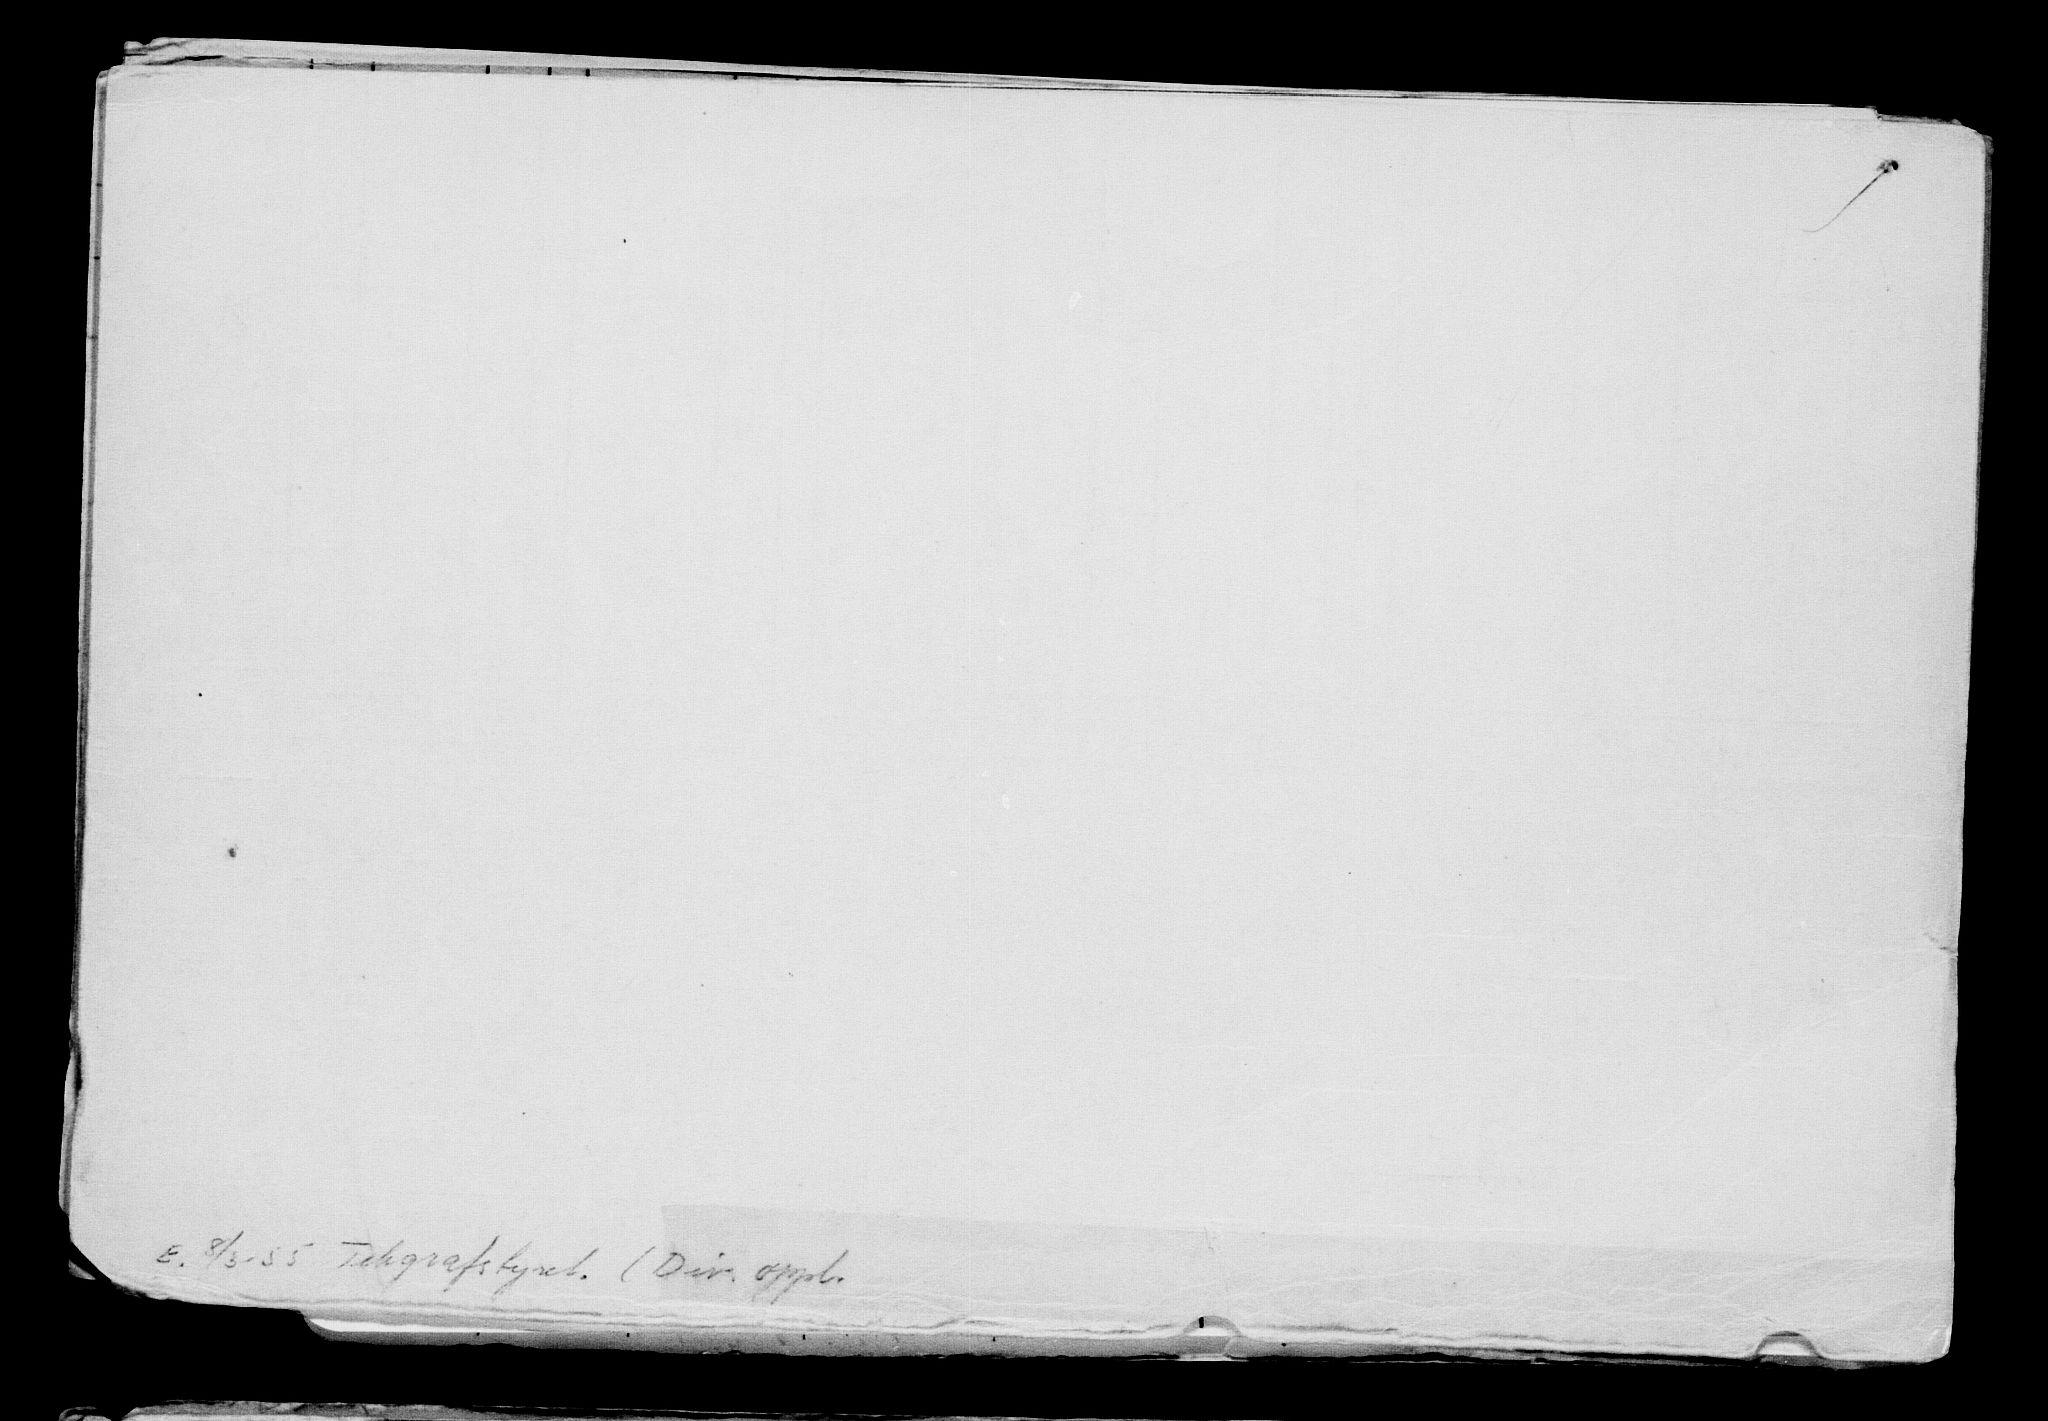 RA, Direktoratet for sjømenn, G/Gb/L0034: Hovedkort, 1899-1900, s. 2